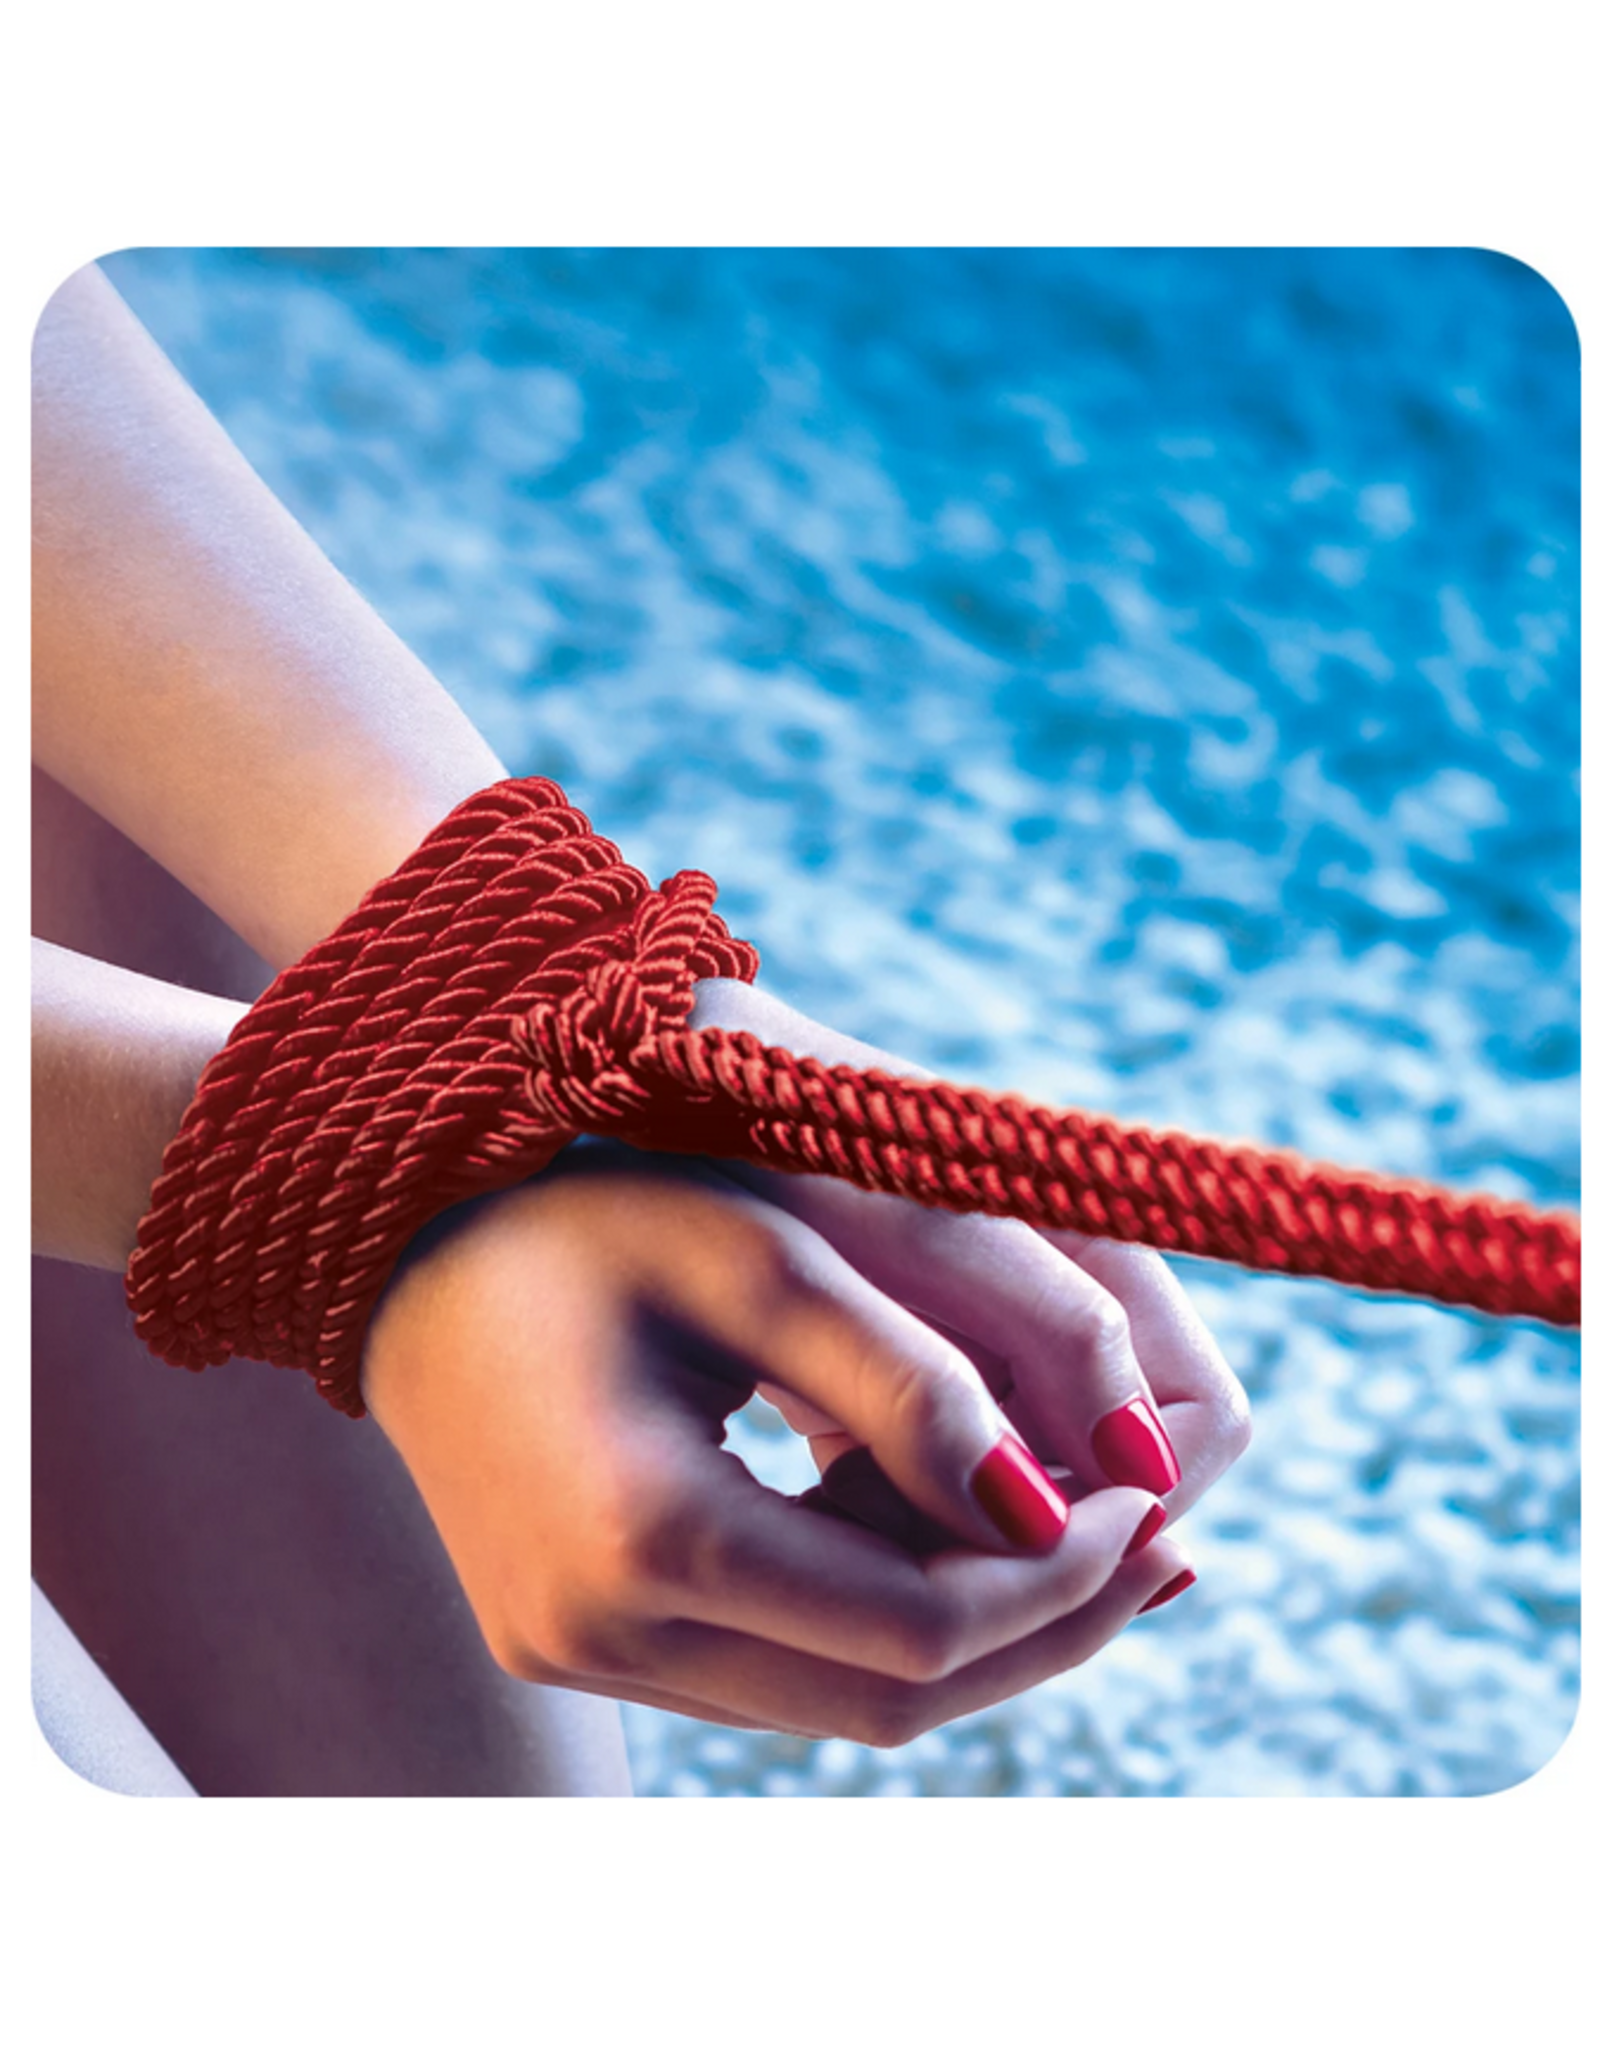 Scandal Scandal BDSM Rope 98.5'/30m  in Red